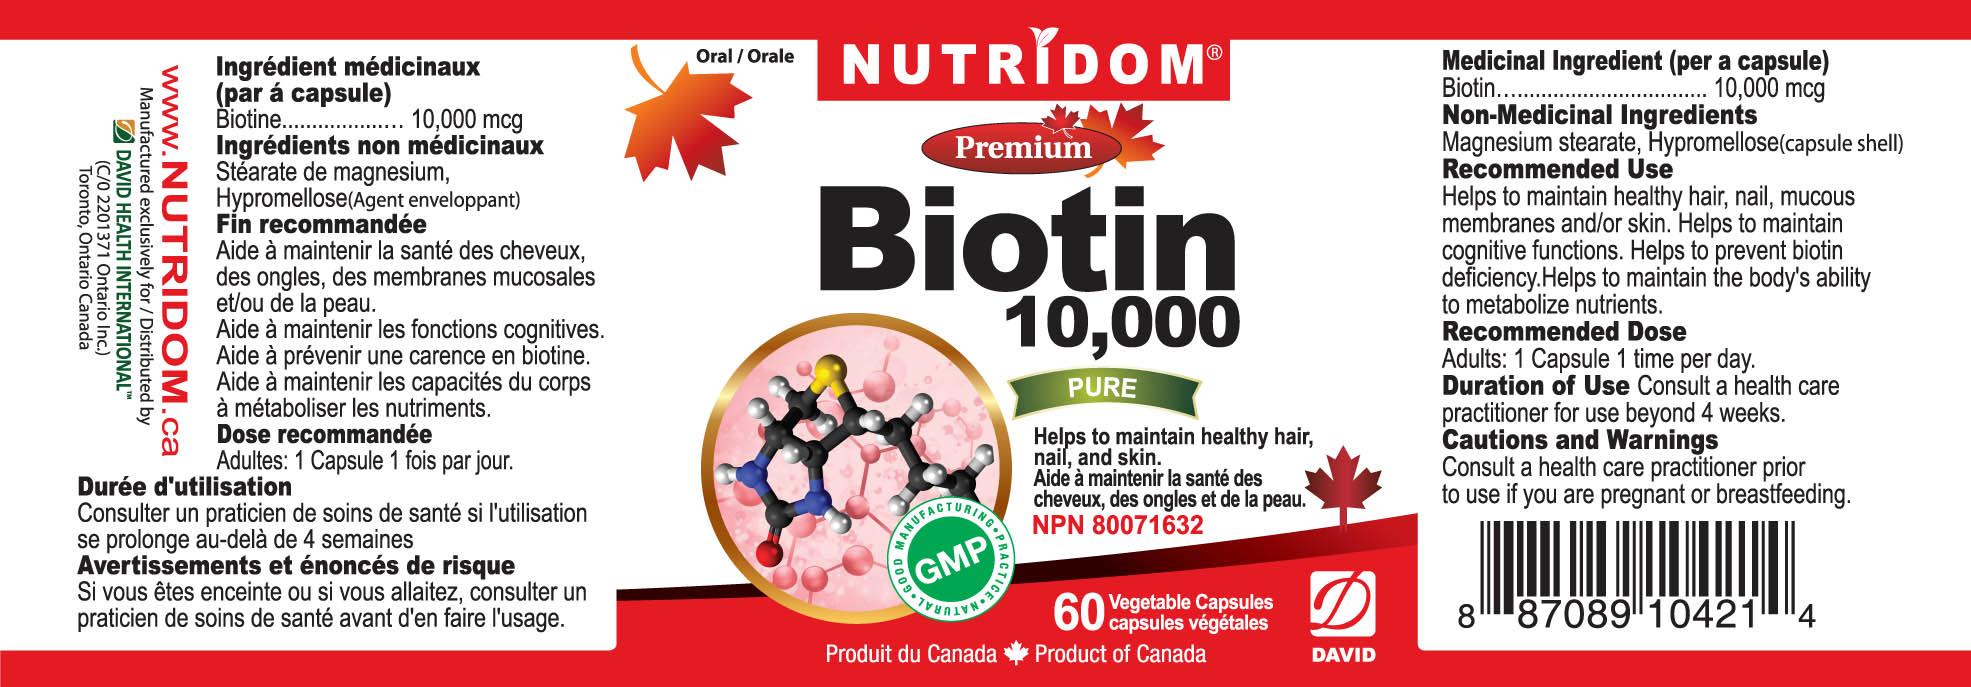 Nutridom Biotin 10,000mcg 60 Vcaps